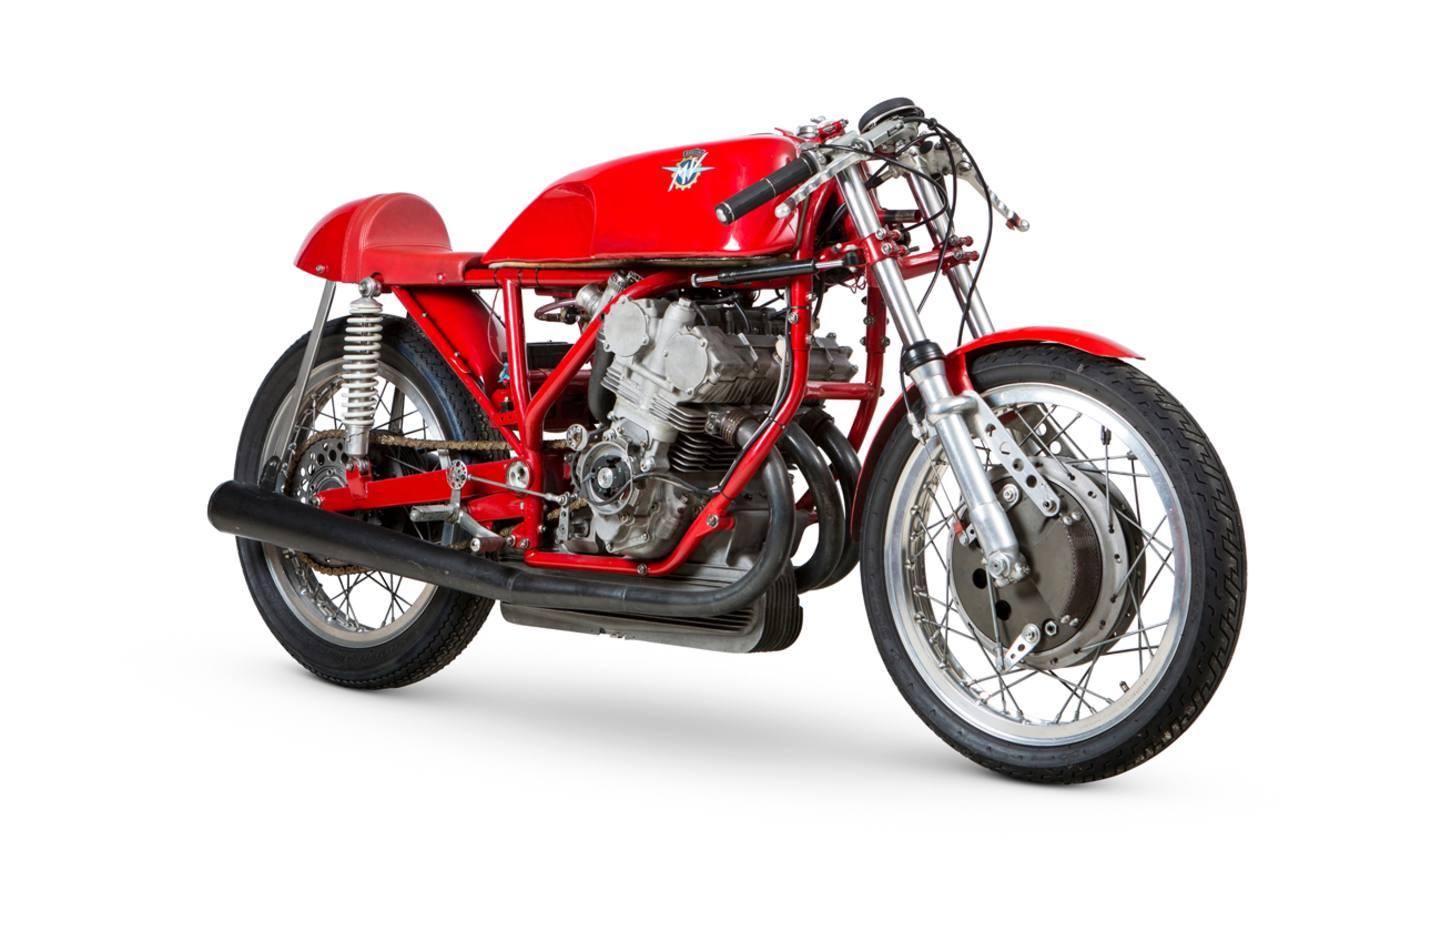 1973 MV Agusta 497.9cc Grand Prix racing motorcycle, £120,000-£160,000